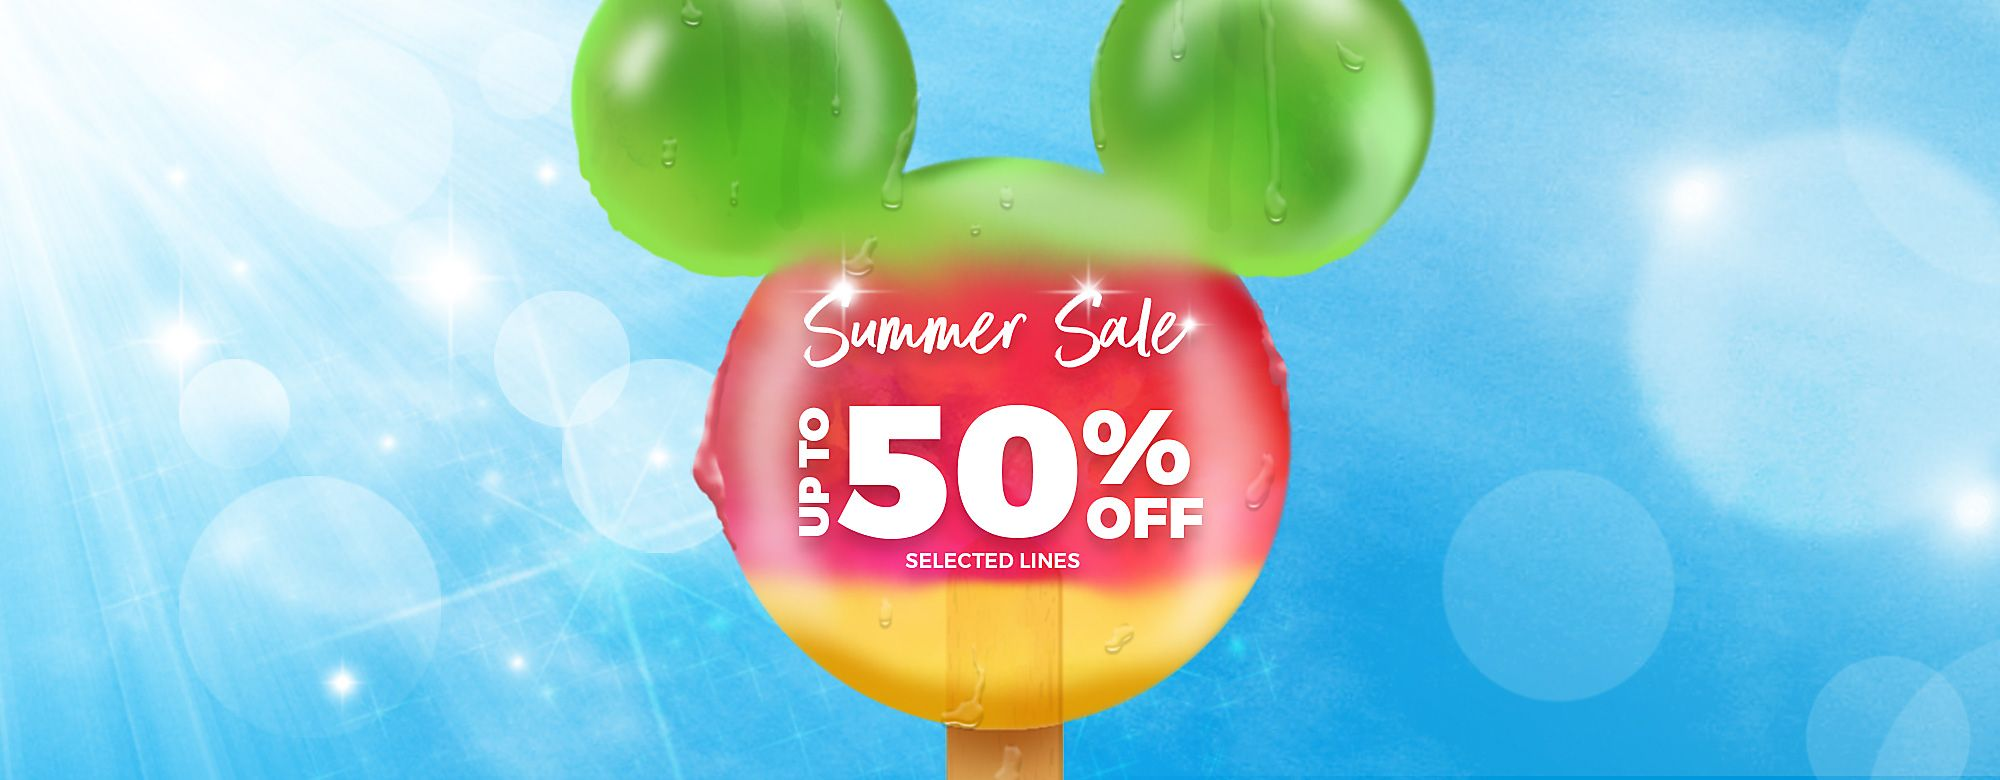 c90a9448b3 Massive Summer Sale | Up to 50% Off | shopDisney